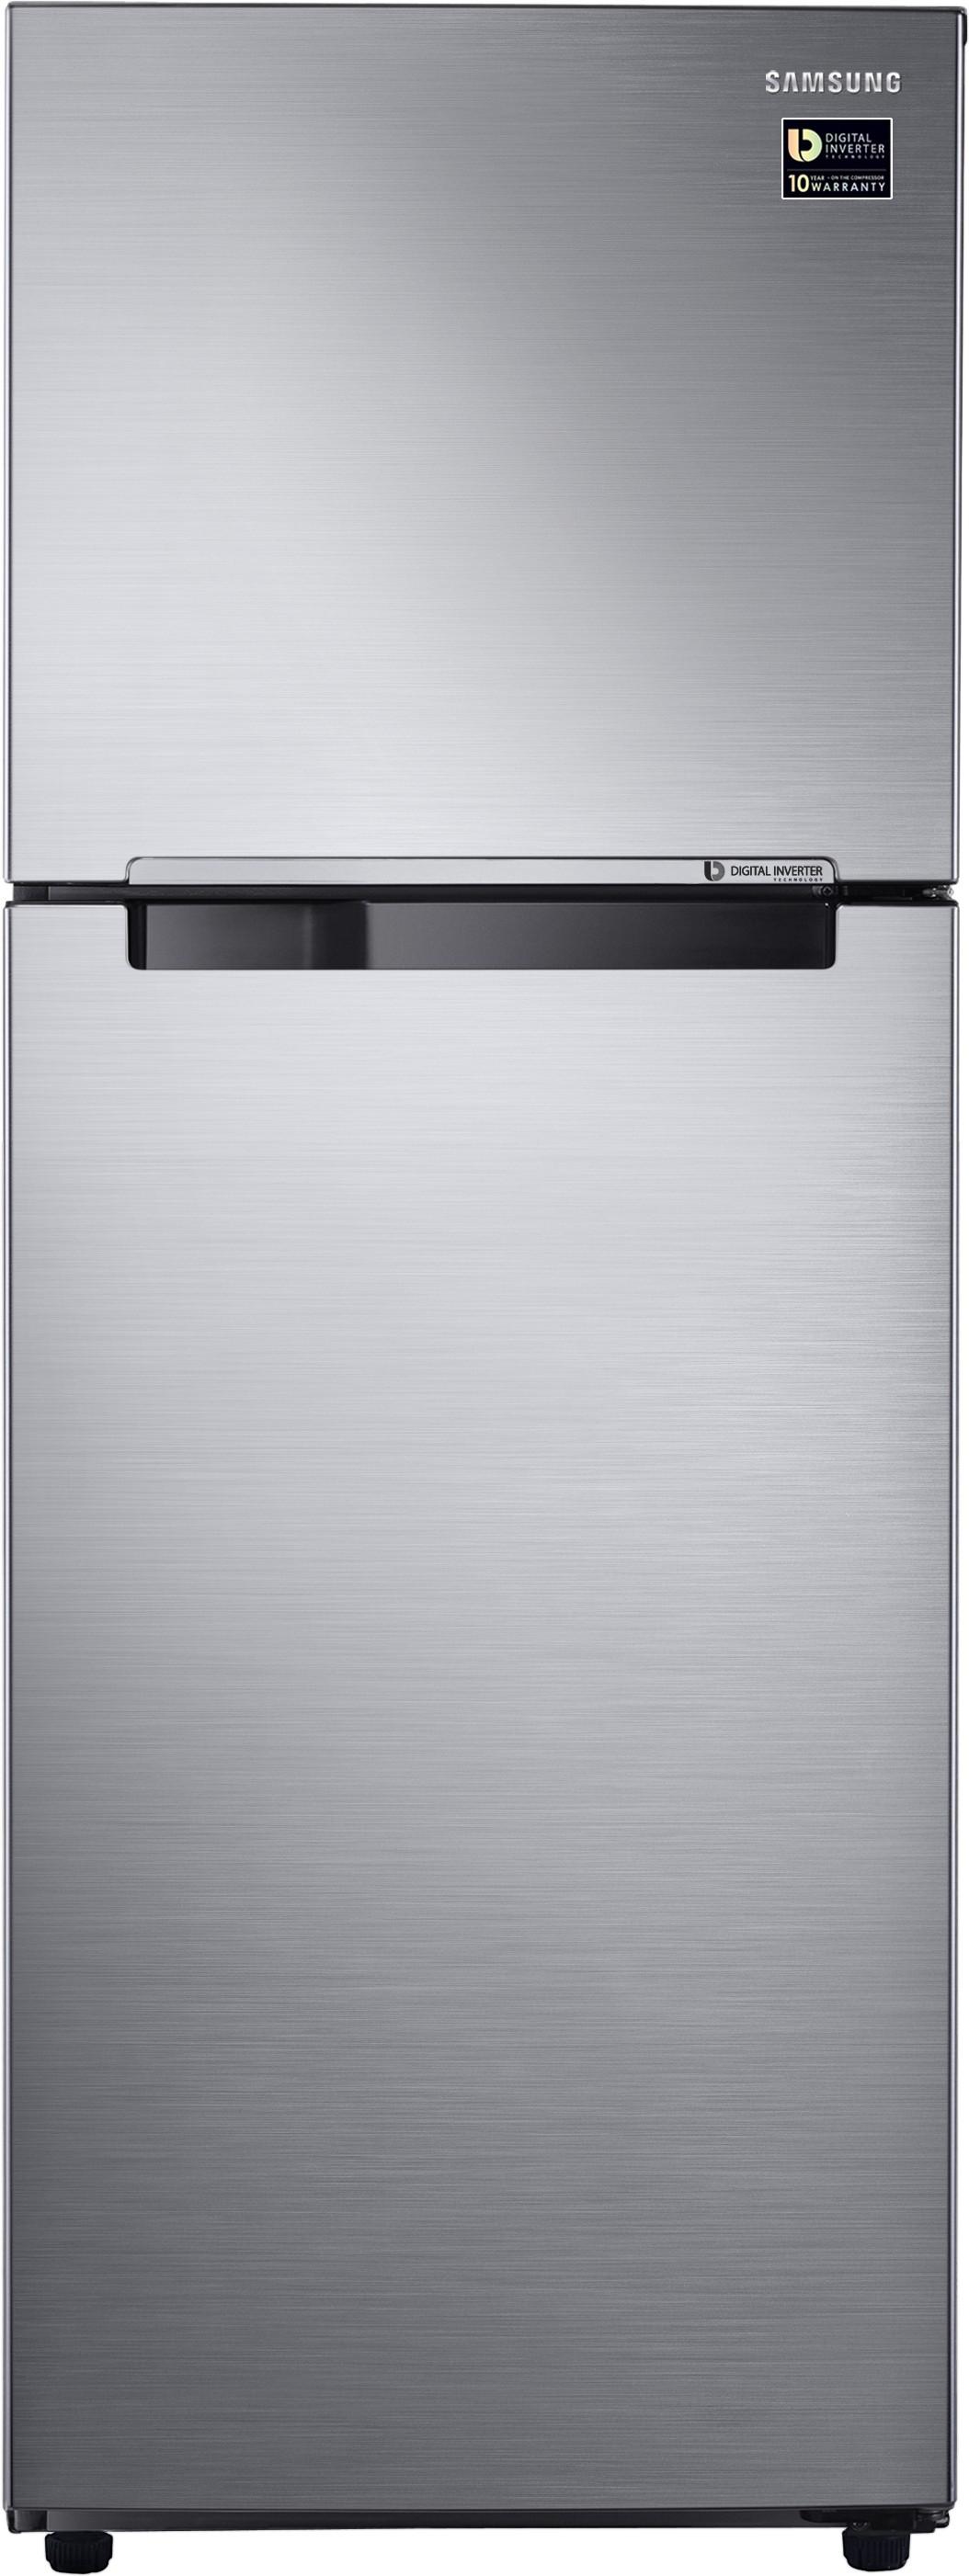 SAMSUNG 321 L Frost Free Double Door Refrigerator(RT34M3023S8-HL/ RT34M3023S8-NL, Elegant Inox, 2017) (Samsung) Tamil Nadu Buy Online